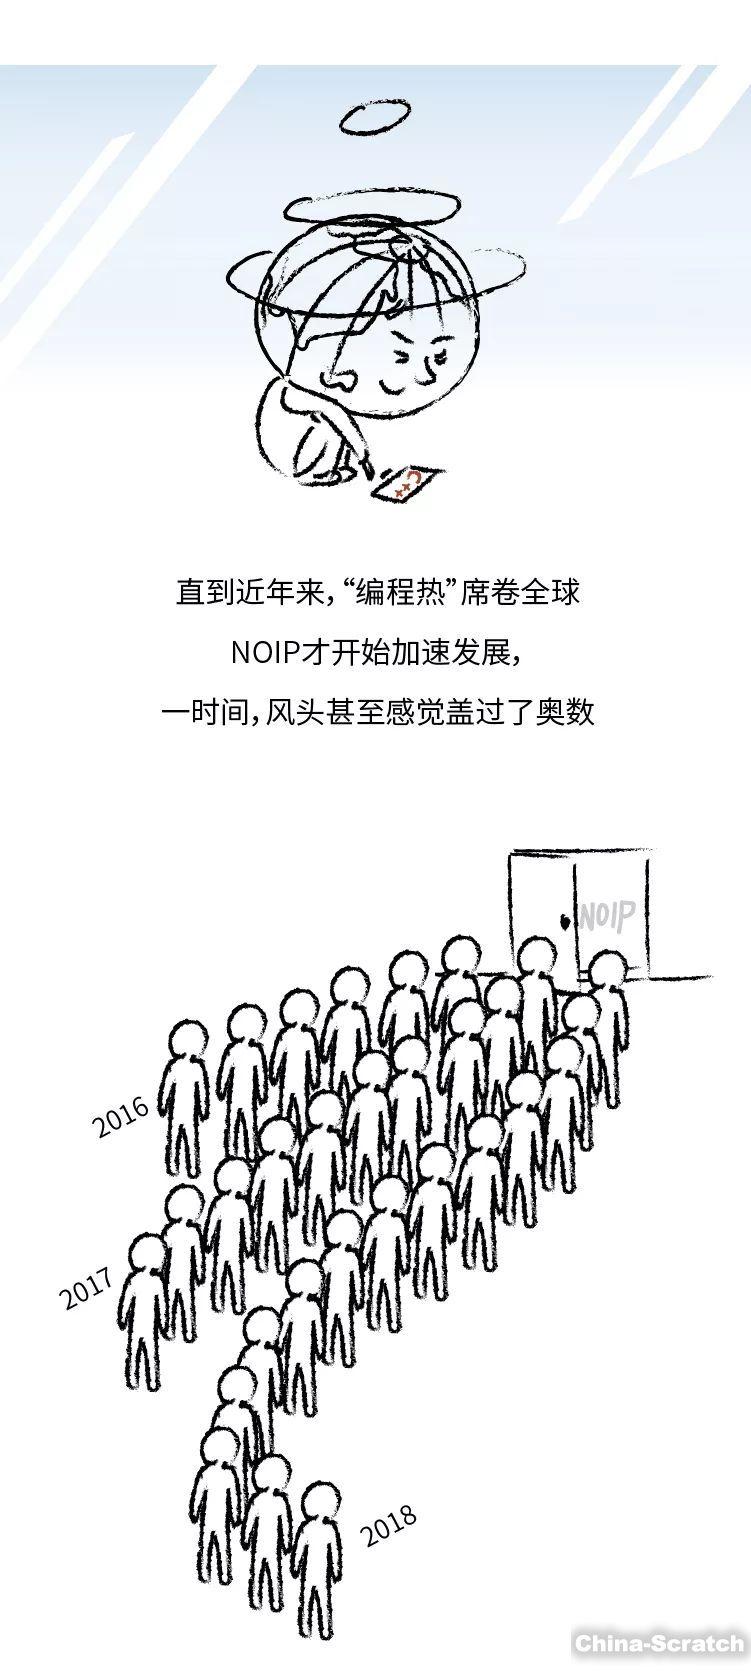 http://www.china-scratch.com/Uploads/timg/190520/1K520H63-2.jpg